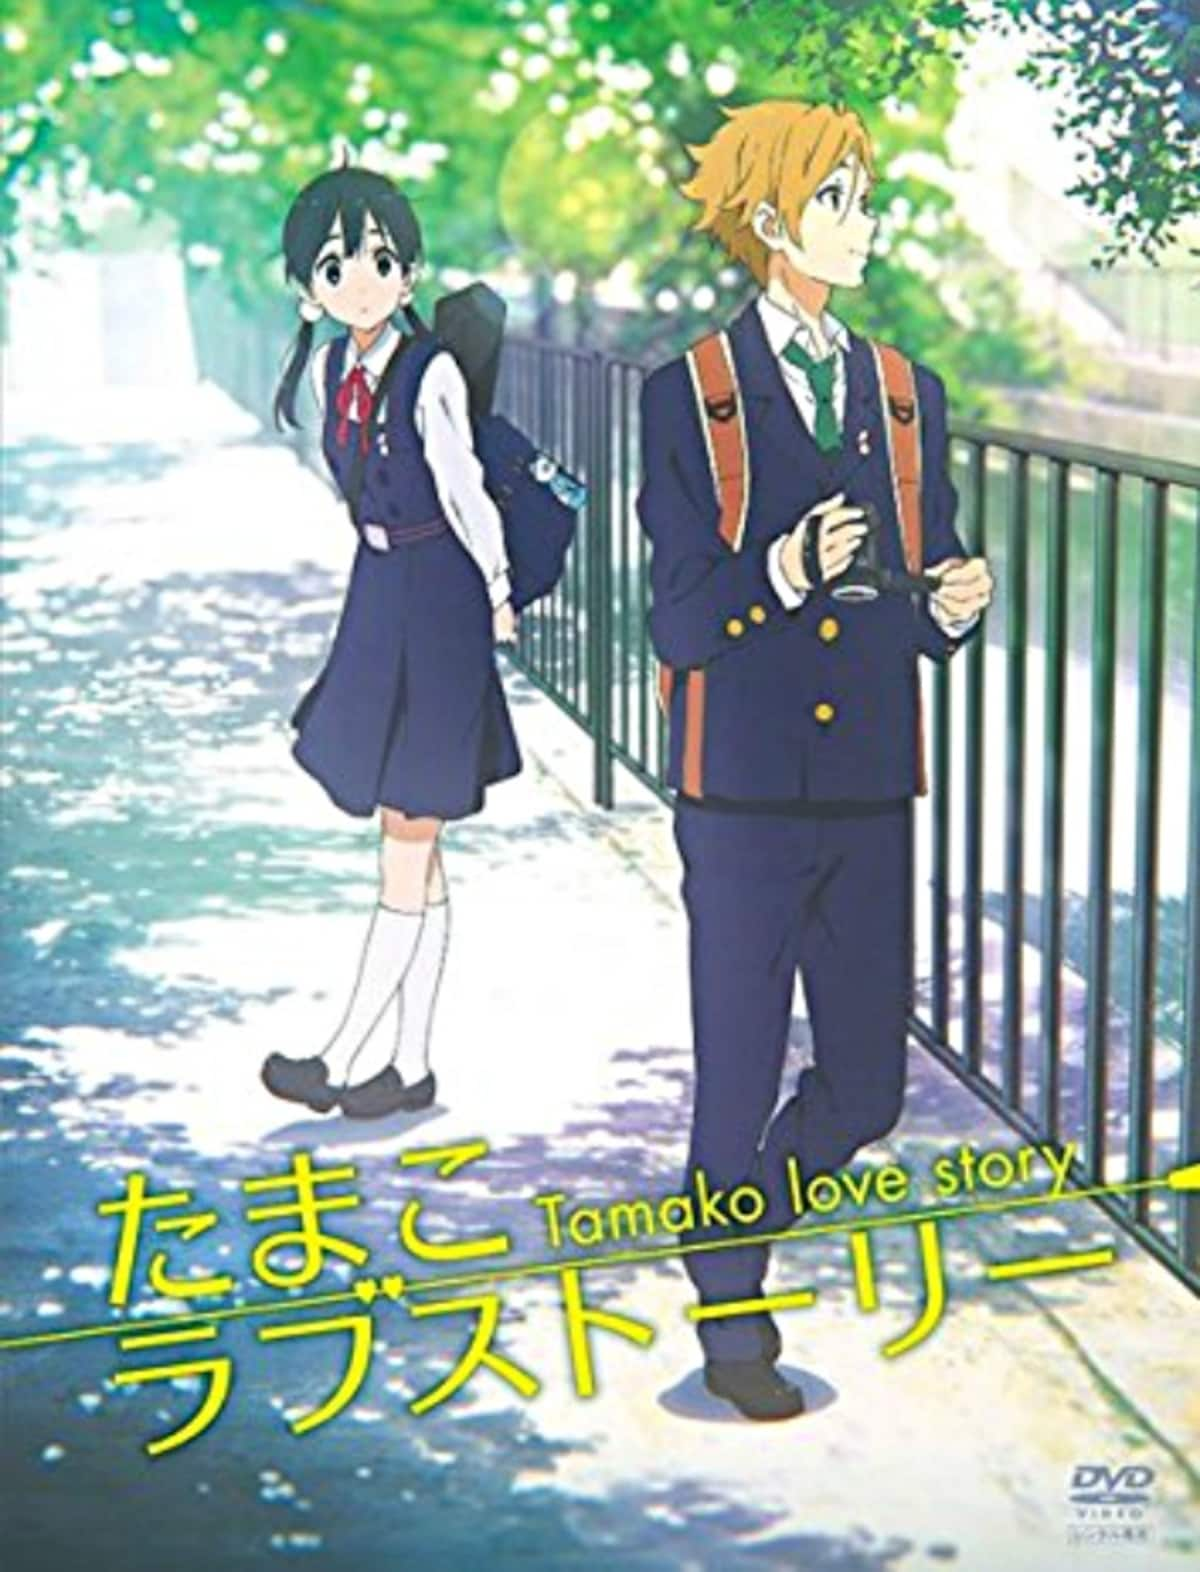 5. Tamako Love Story